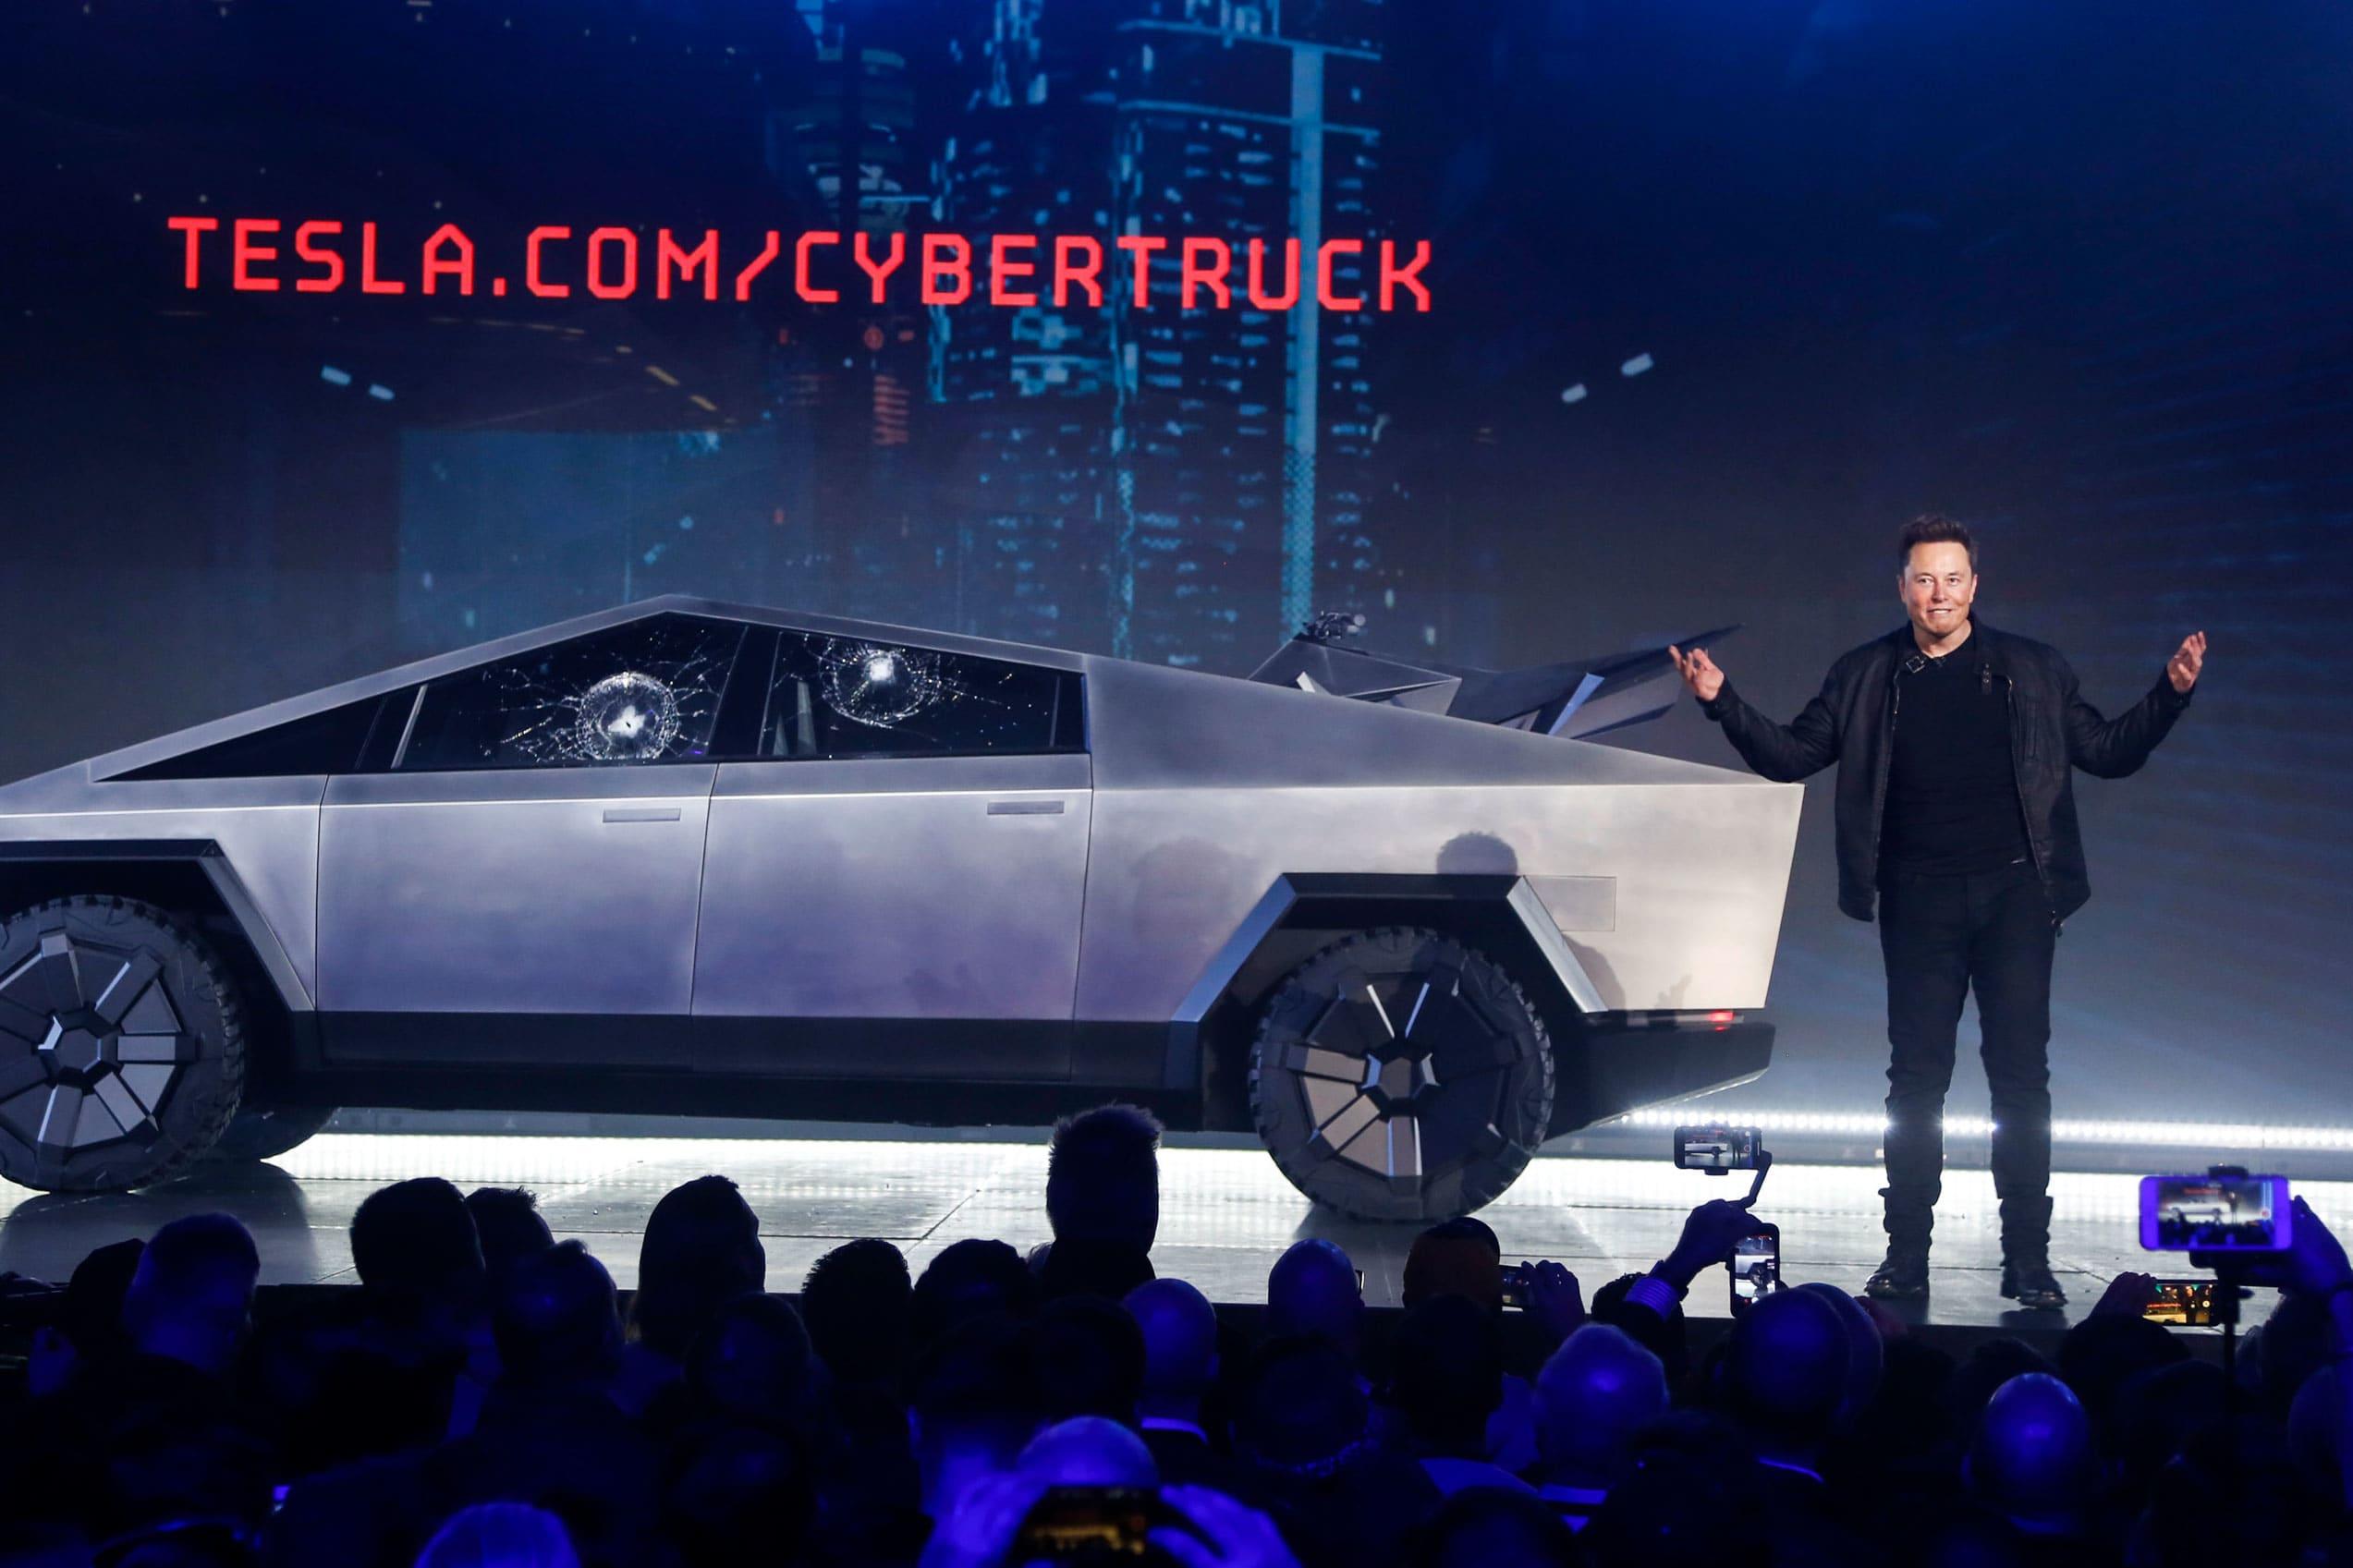 Big brands troll Elon Musk's Cybertruck with their own versions on Twitter